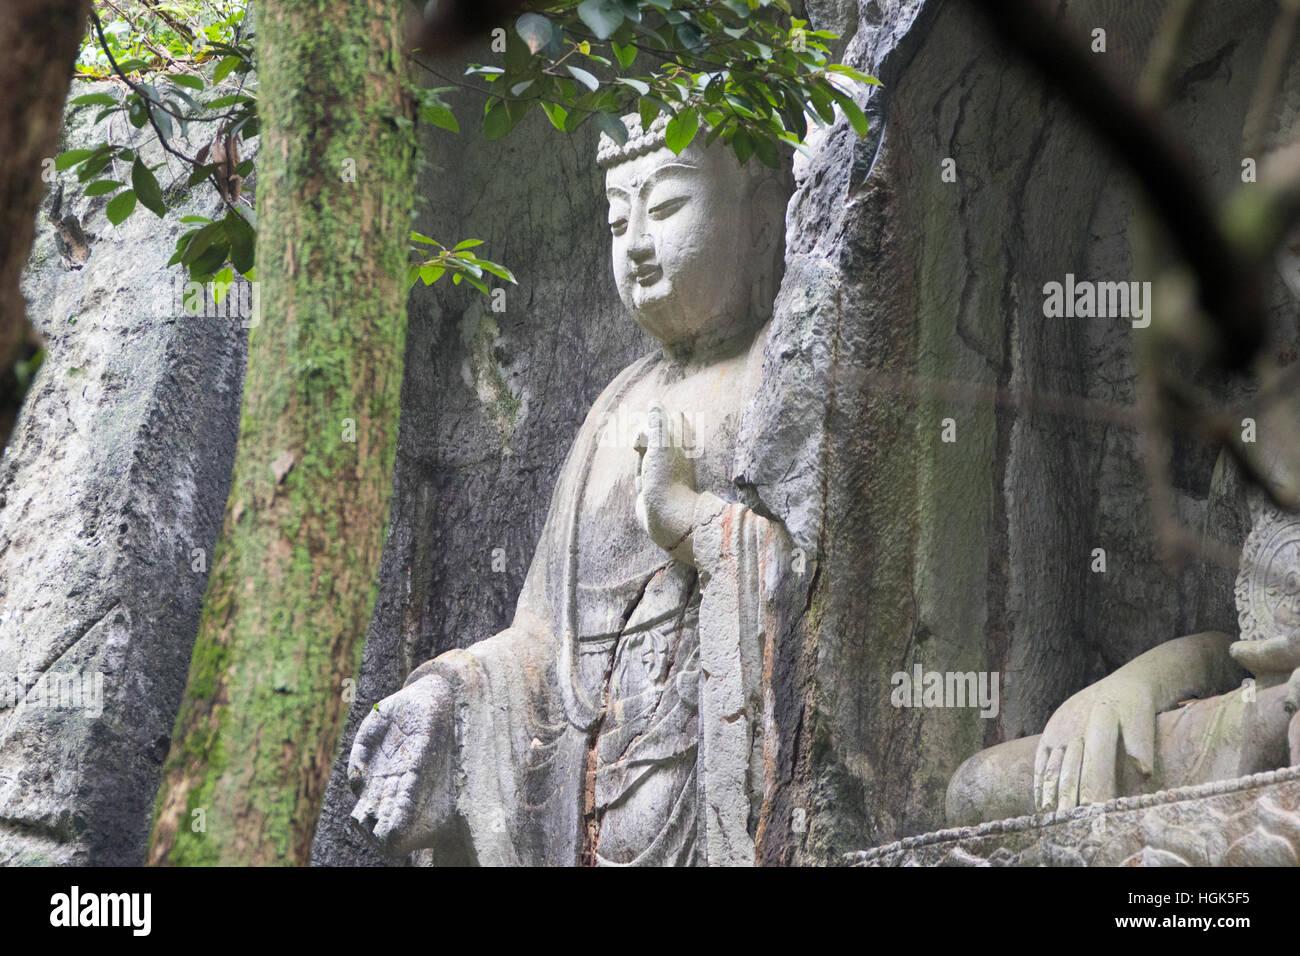 Buddha, Feilai Feng limestone grottoes at Ling Yin temple Hangzhou China - Stock Image